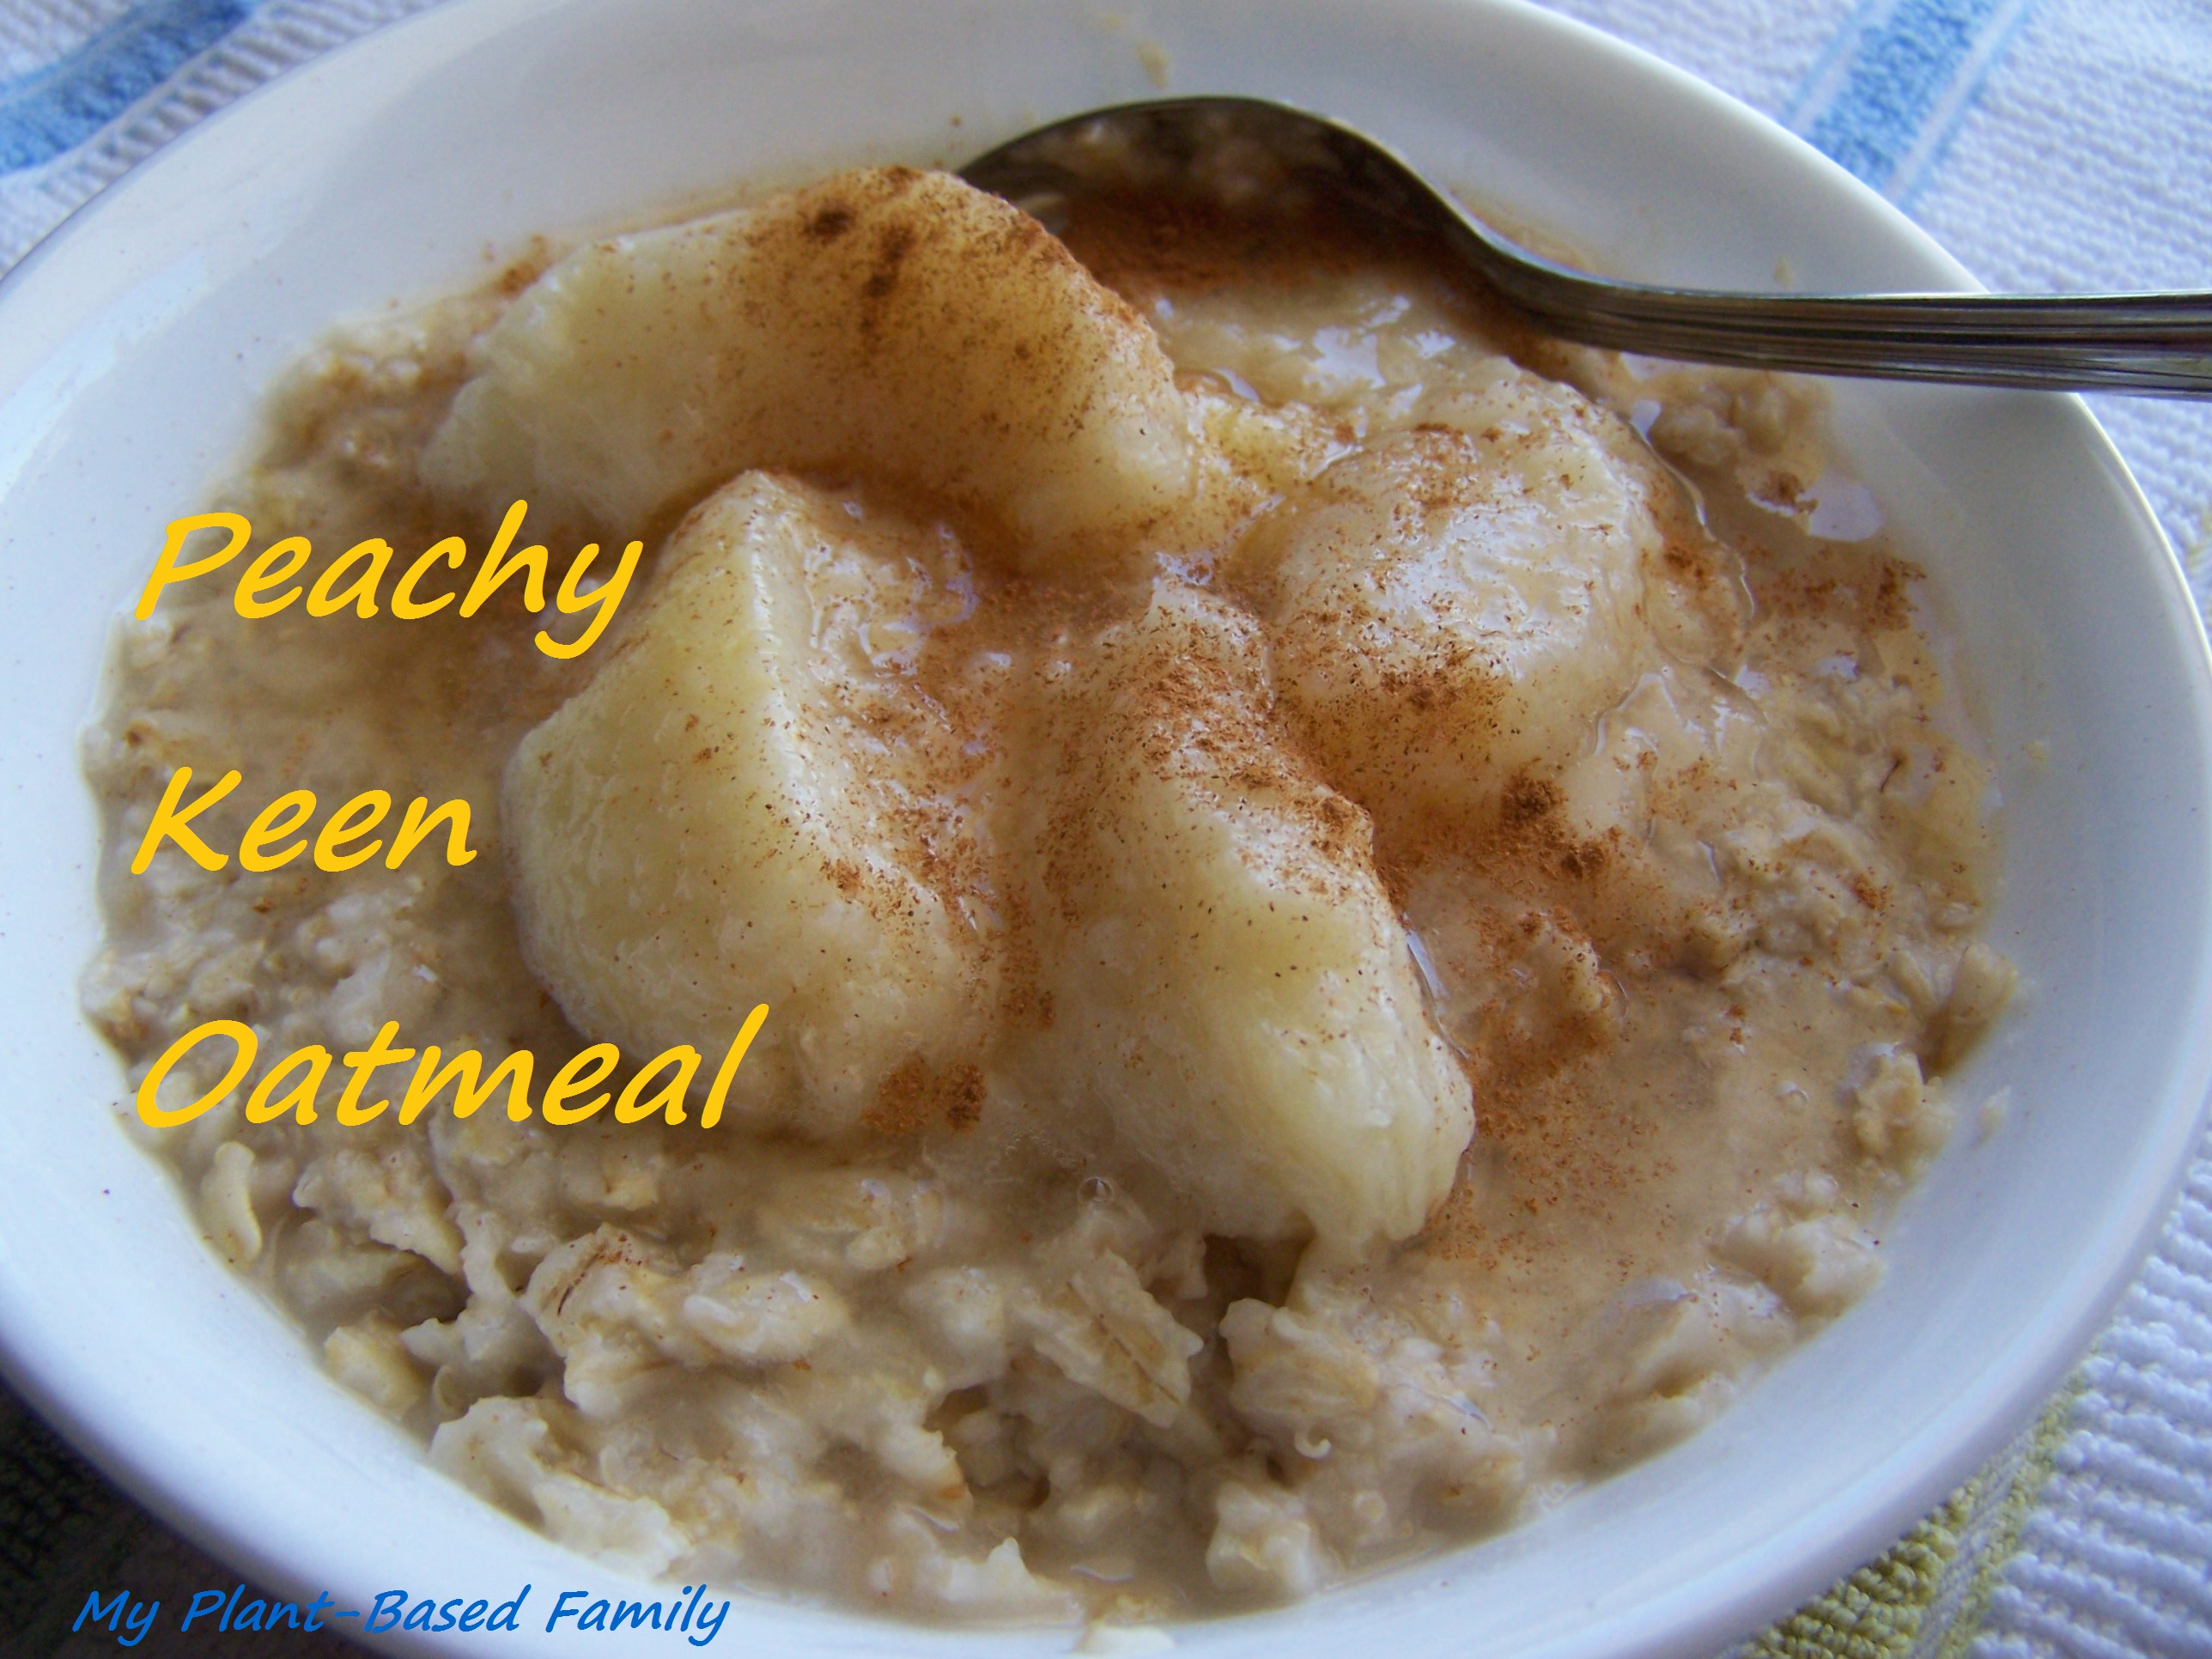 peachy keen oatmeal